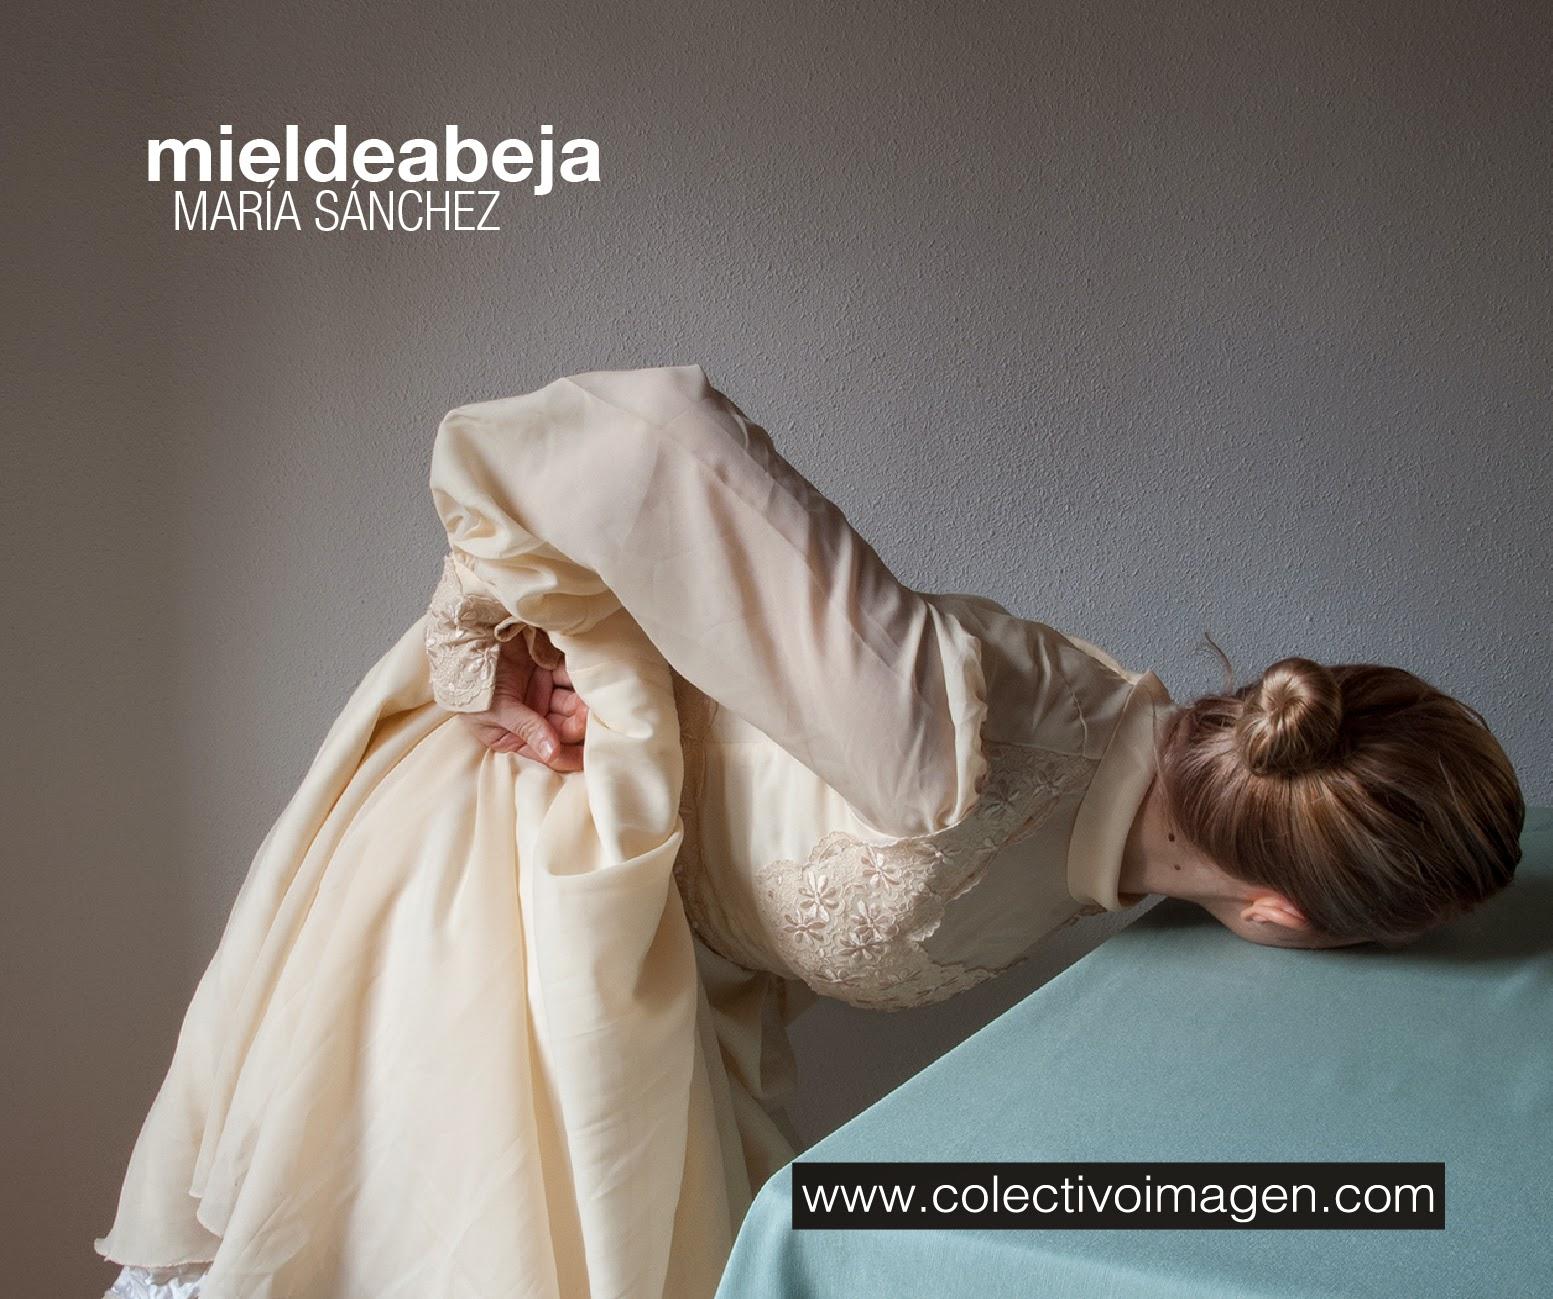 Mieldeabeja - María Sánchez